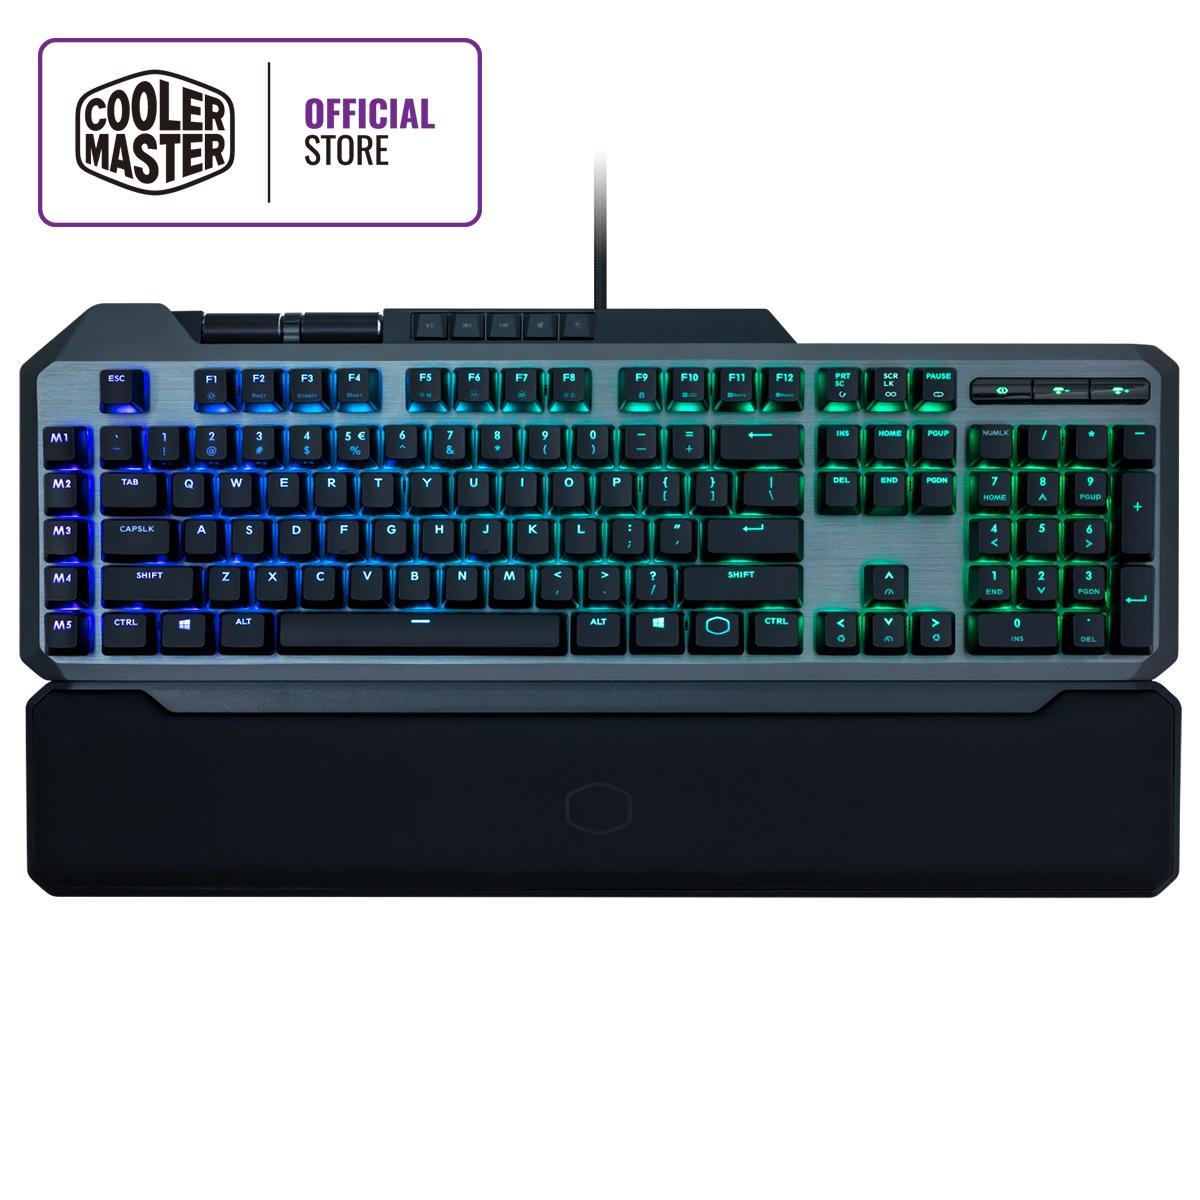 Cooler Master MK850 Cherry MX RGB Mechanical Gaming Keyboard with Aimpad™ Pressure Sensitive Technology, Dedicated Macro Keys, Dedicated Media Keys & 2 Precision Wheels, RGB Lightbar, Magnetic Wrist Rest  (Full Layout with Macros / 109 Keys) Singapore